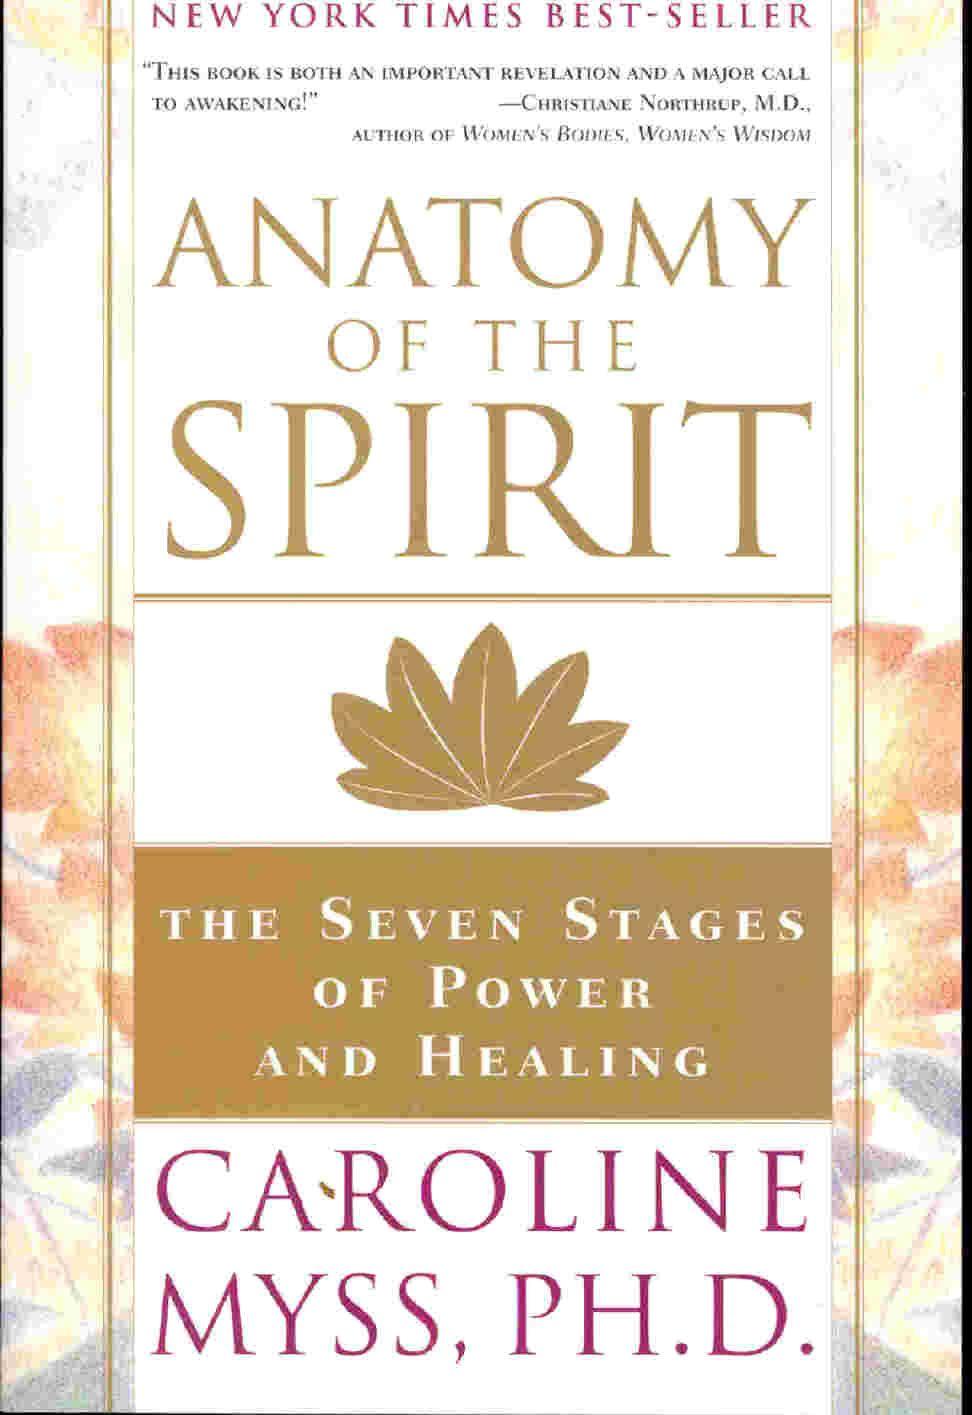 Wonderful Book By One Of My Favorite Authors Caroline Myss